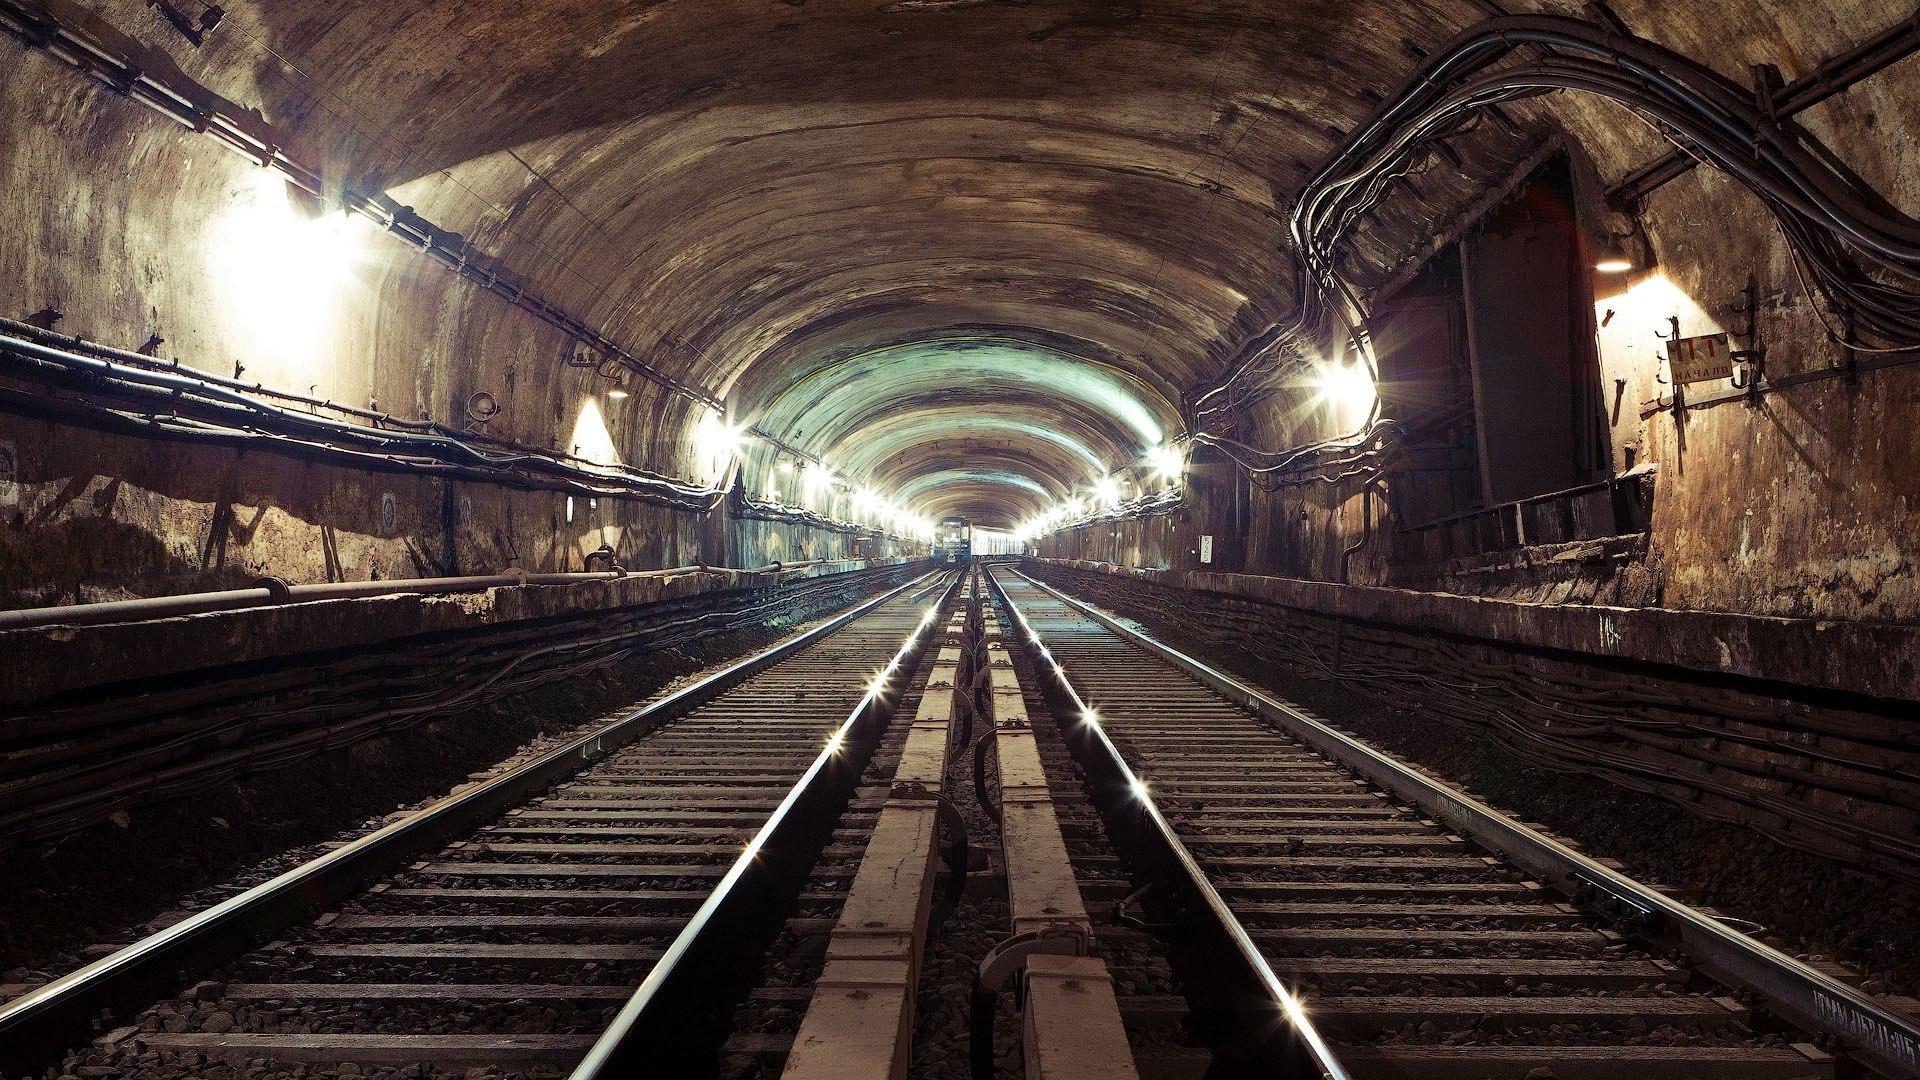 Subway architecture buildings tunnel room tracks railroad